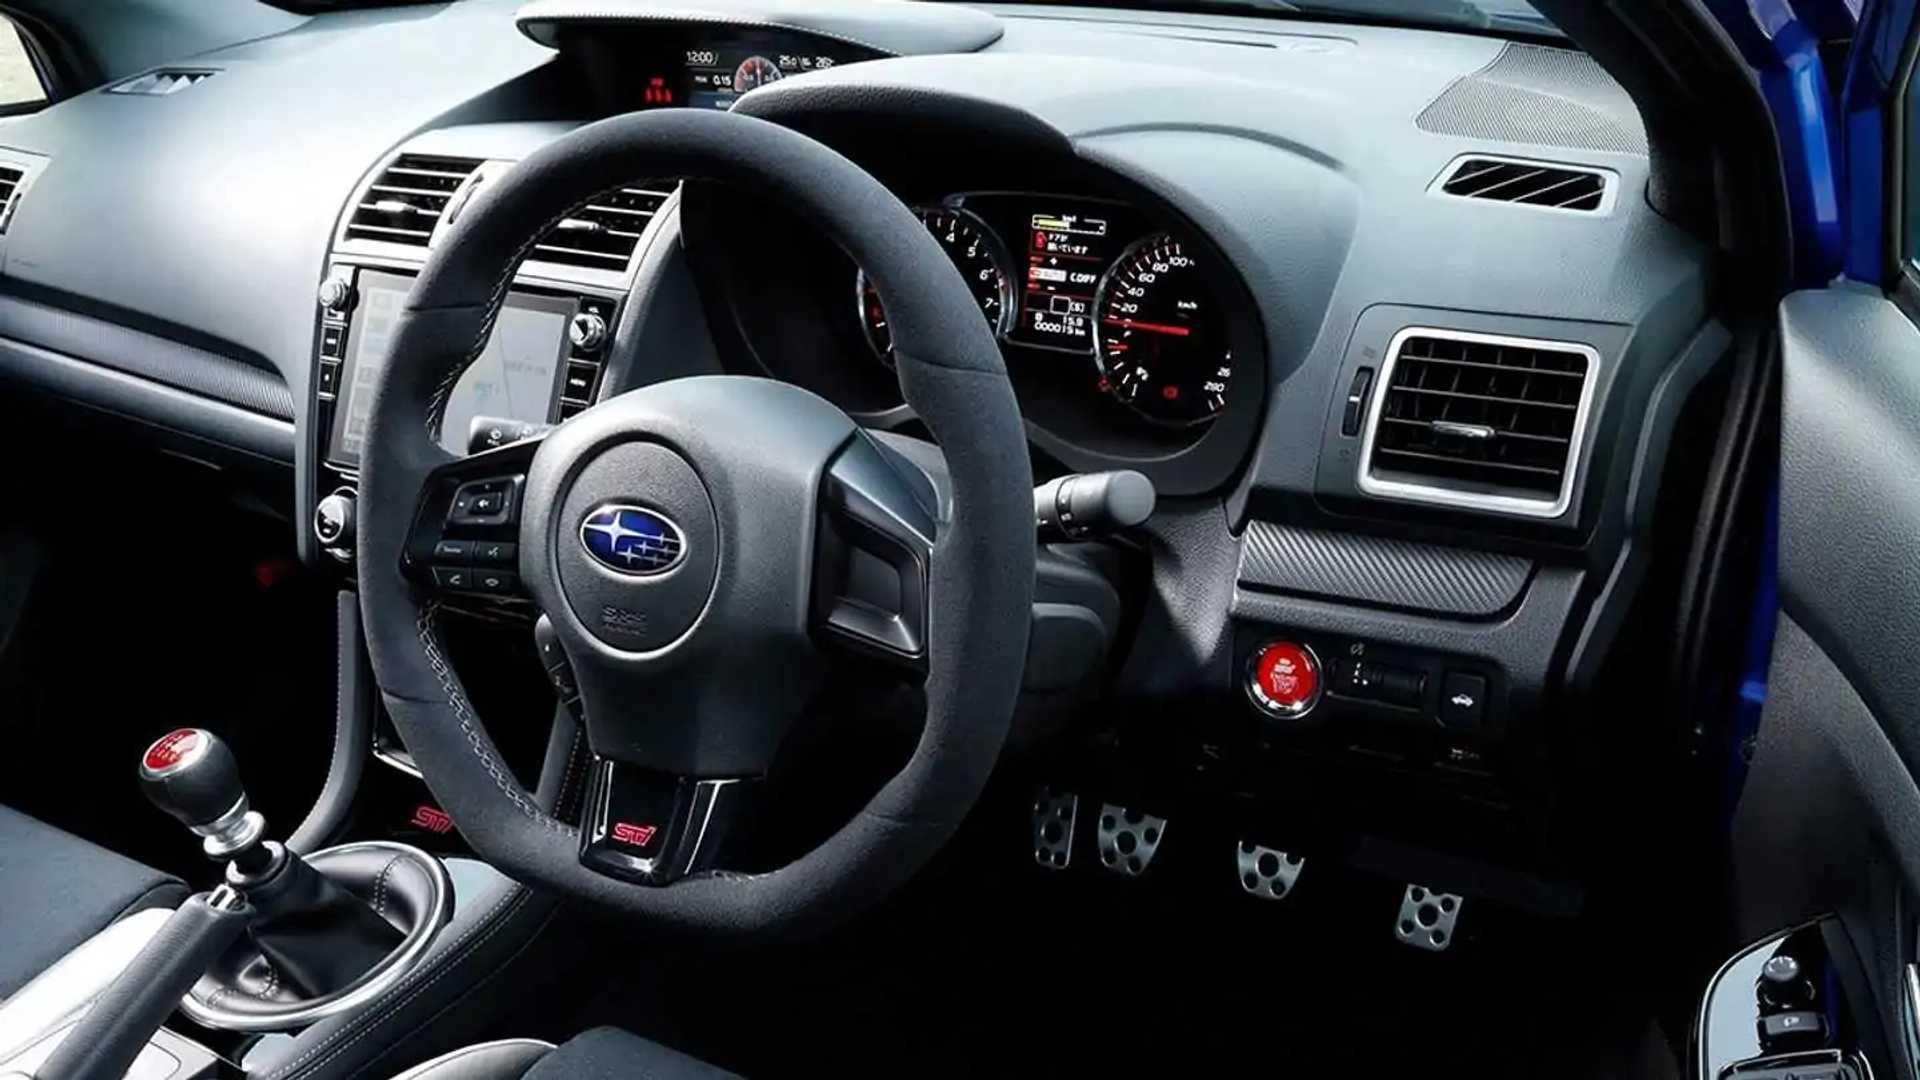 2014 - [Subaru] Impreza WRX/STi  - Page 6 Subaru-wrx-sti-ej20-final-edition-prototype